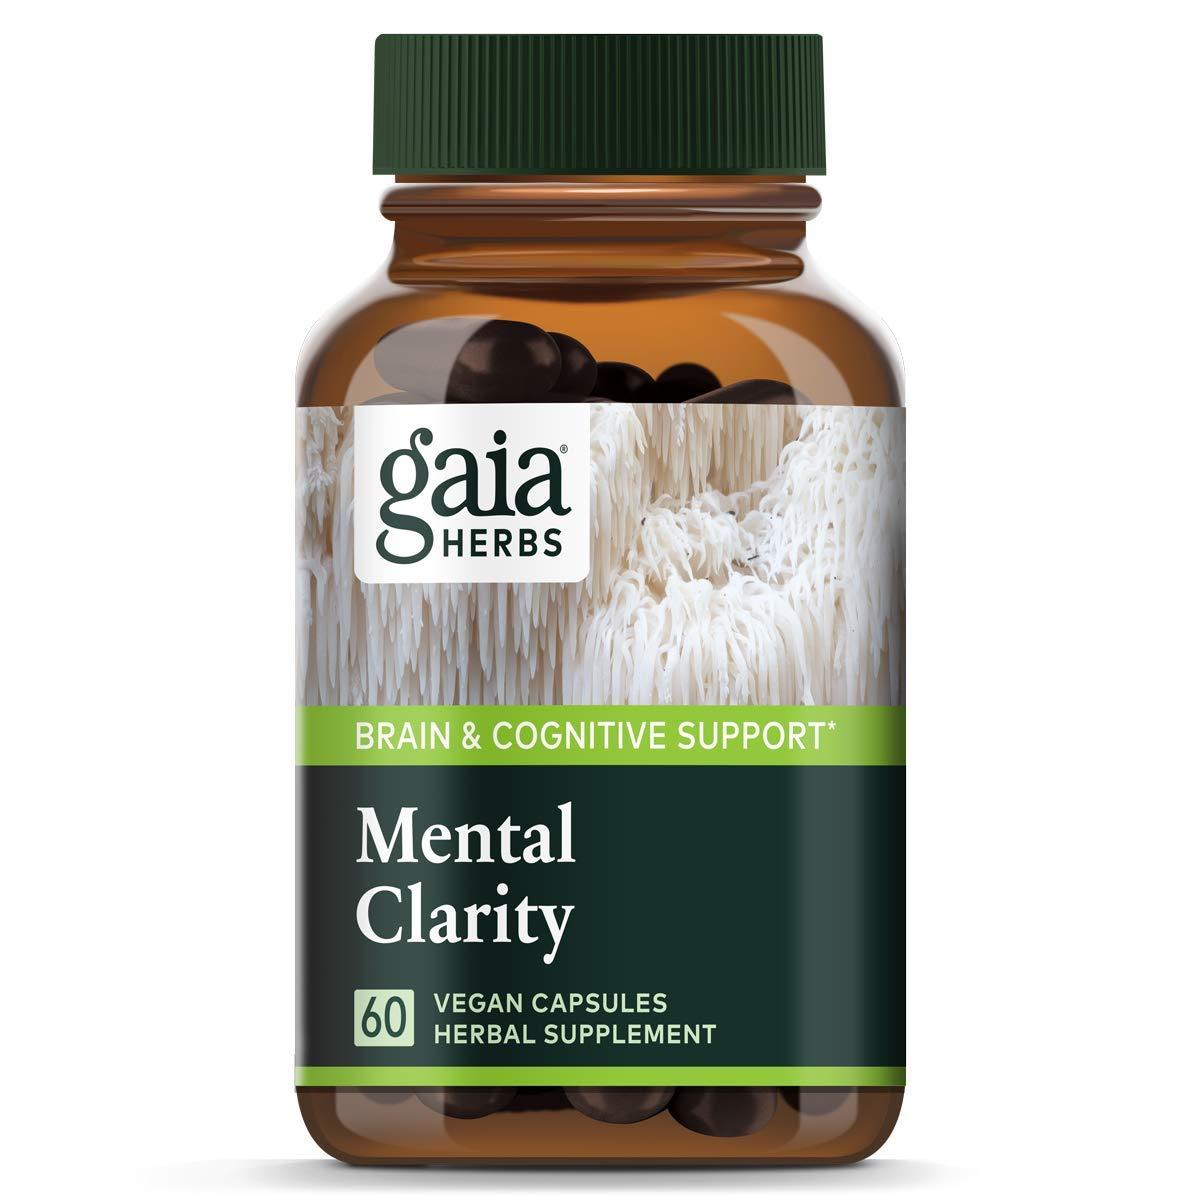 Gaia Herbs, Mushrooms + Herbs Mental Clarity, Brain & Cognitive Support, Cordyceps, Reishi, Gotu Kola, Vegan Powder Capsules, 60 Count